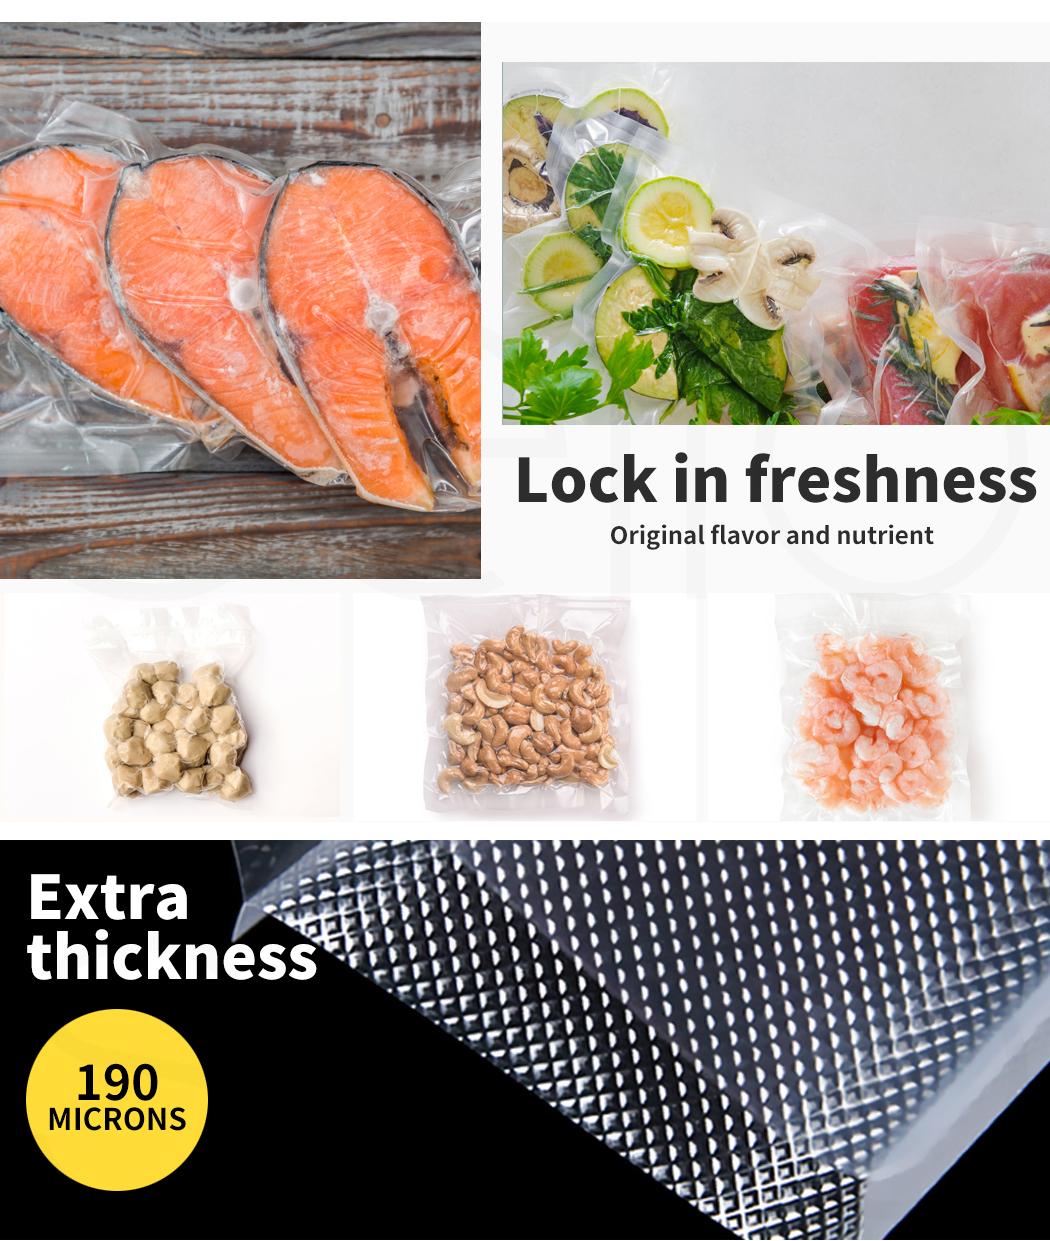 thumbnail 27 - Vacuum Food Sealer Storage Bags Saver Seal Bags Commercial Heat 100/200/500x